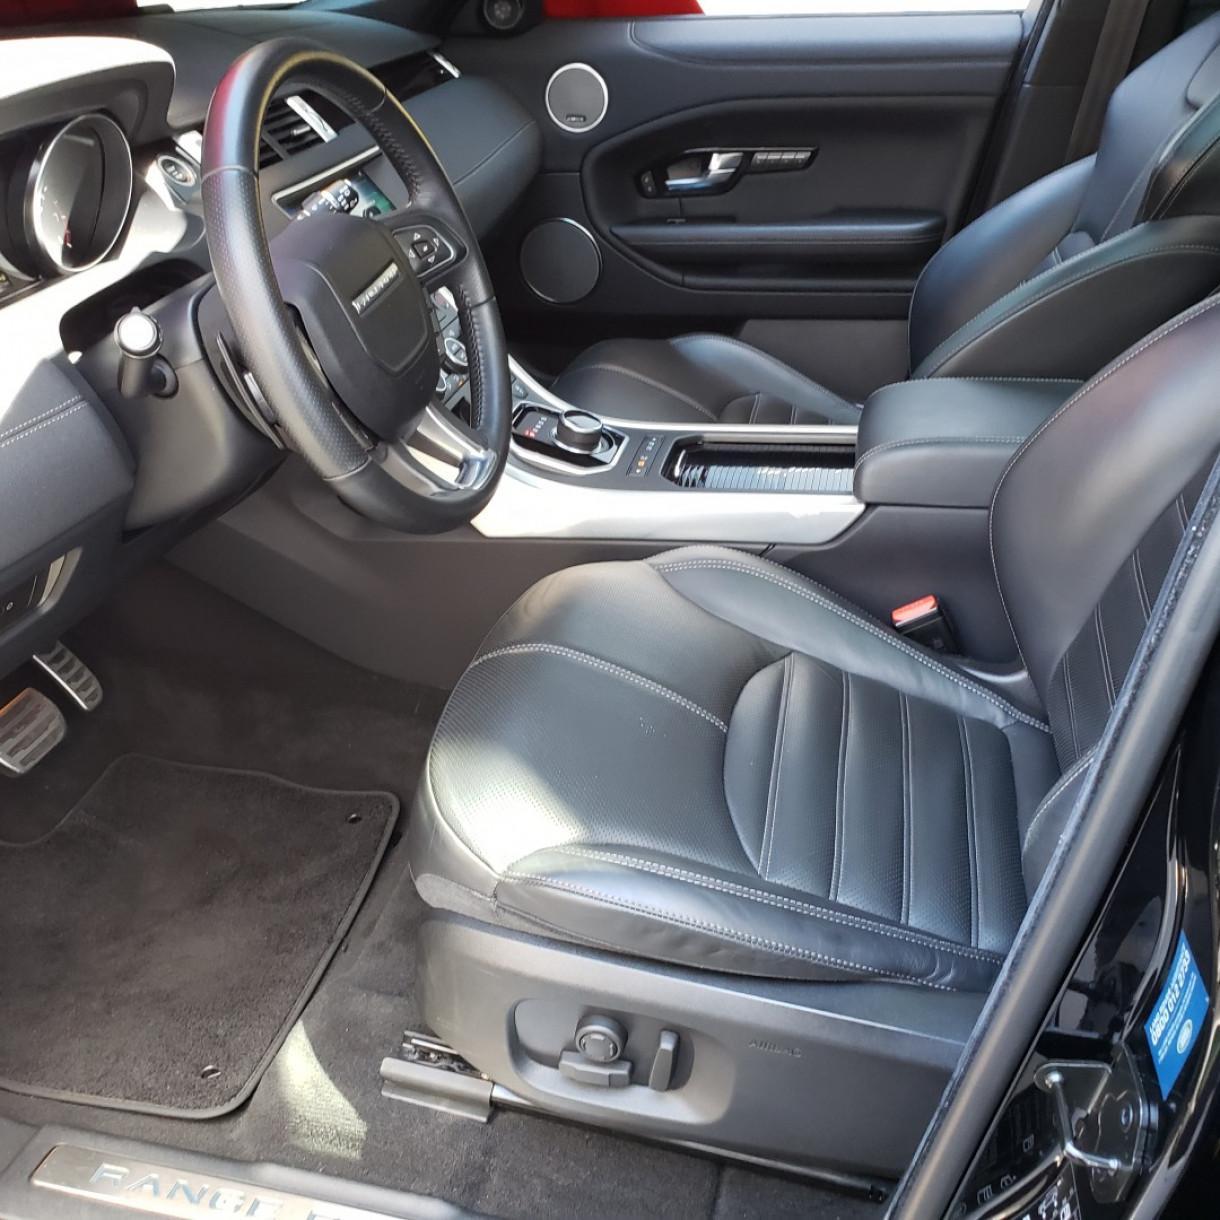 LAND ROVER Range Rover Evoque 2.0 16V 4P HSE 4WD DYNAMIC AUTOMÁTICO, Foto 10